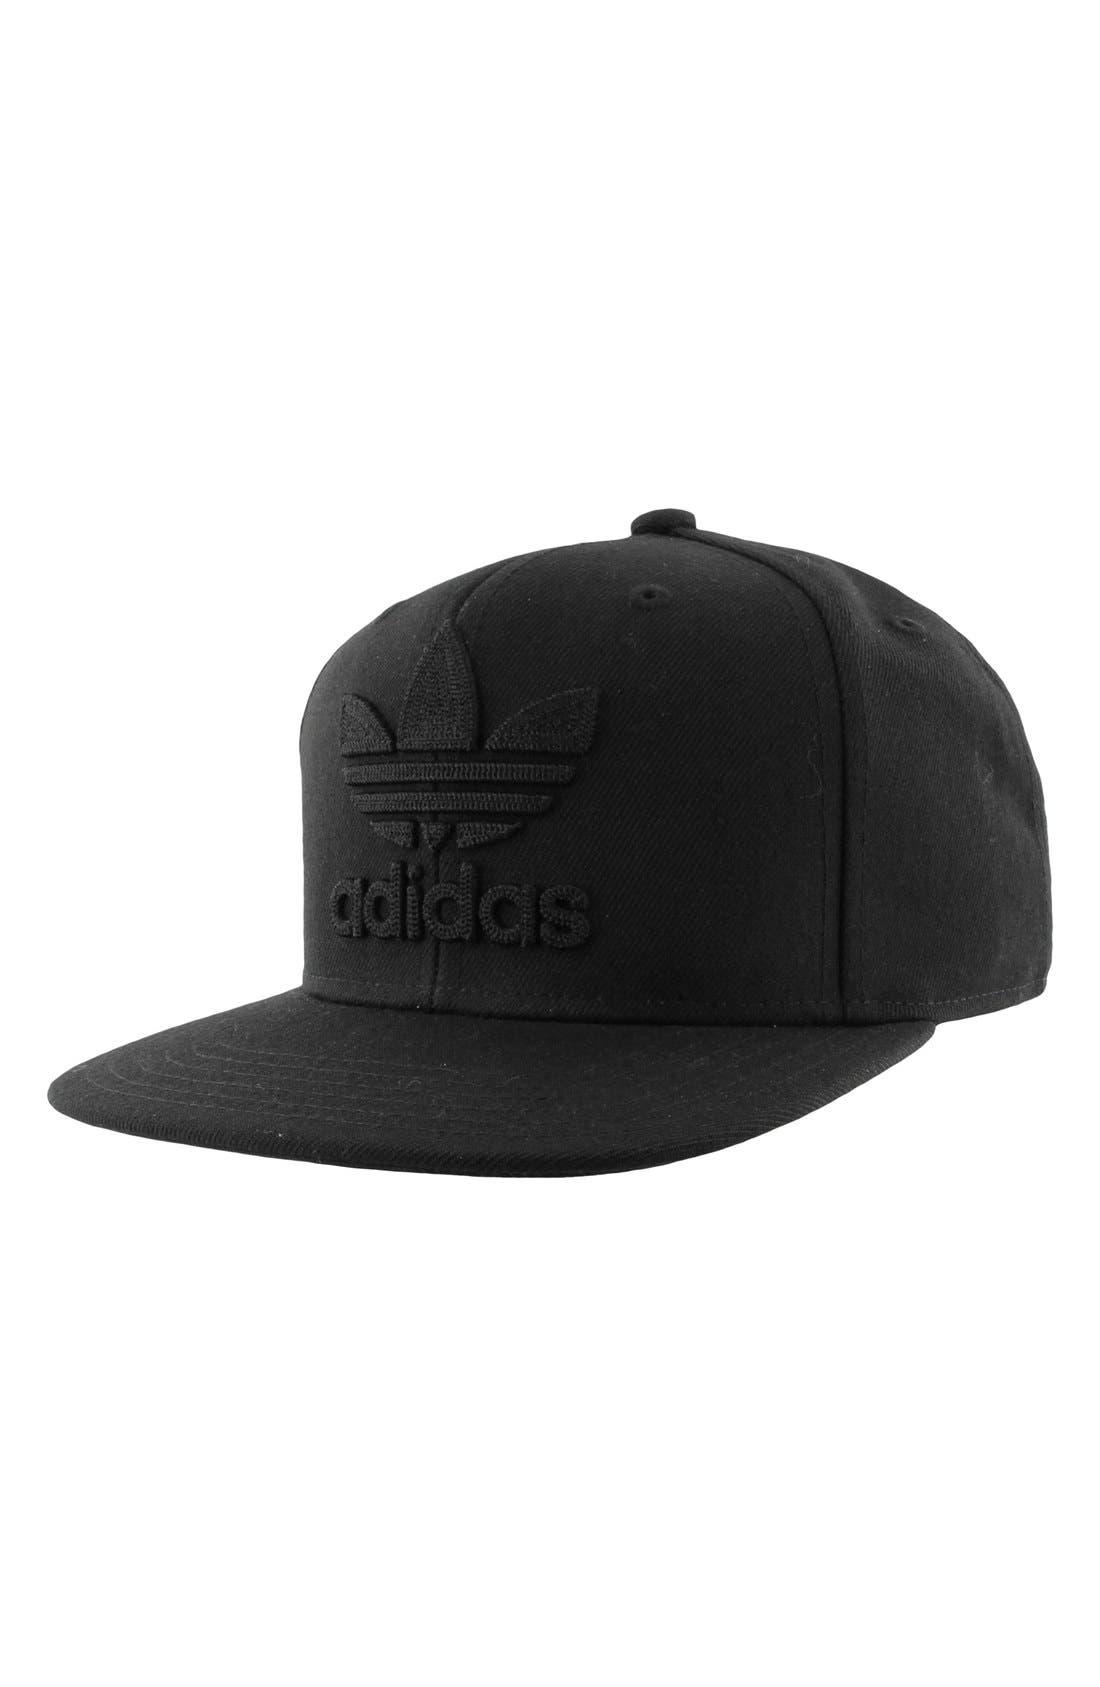 'Trefoil Chain' Snapback Cap,                         Main,                         color, Black/ Black